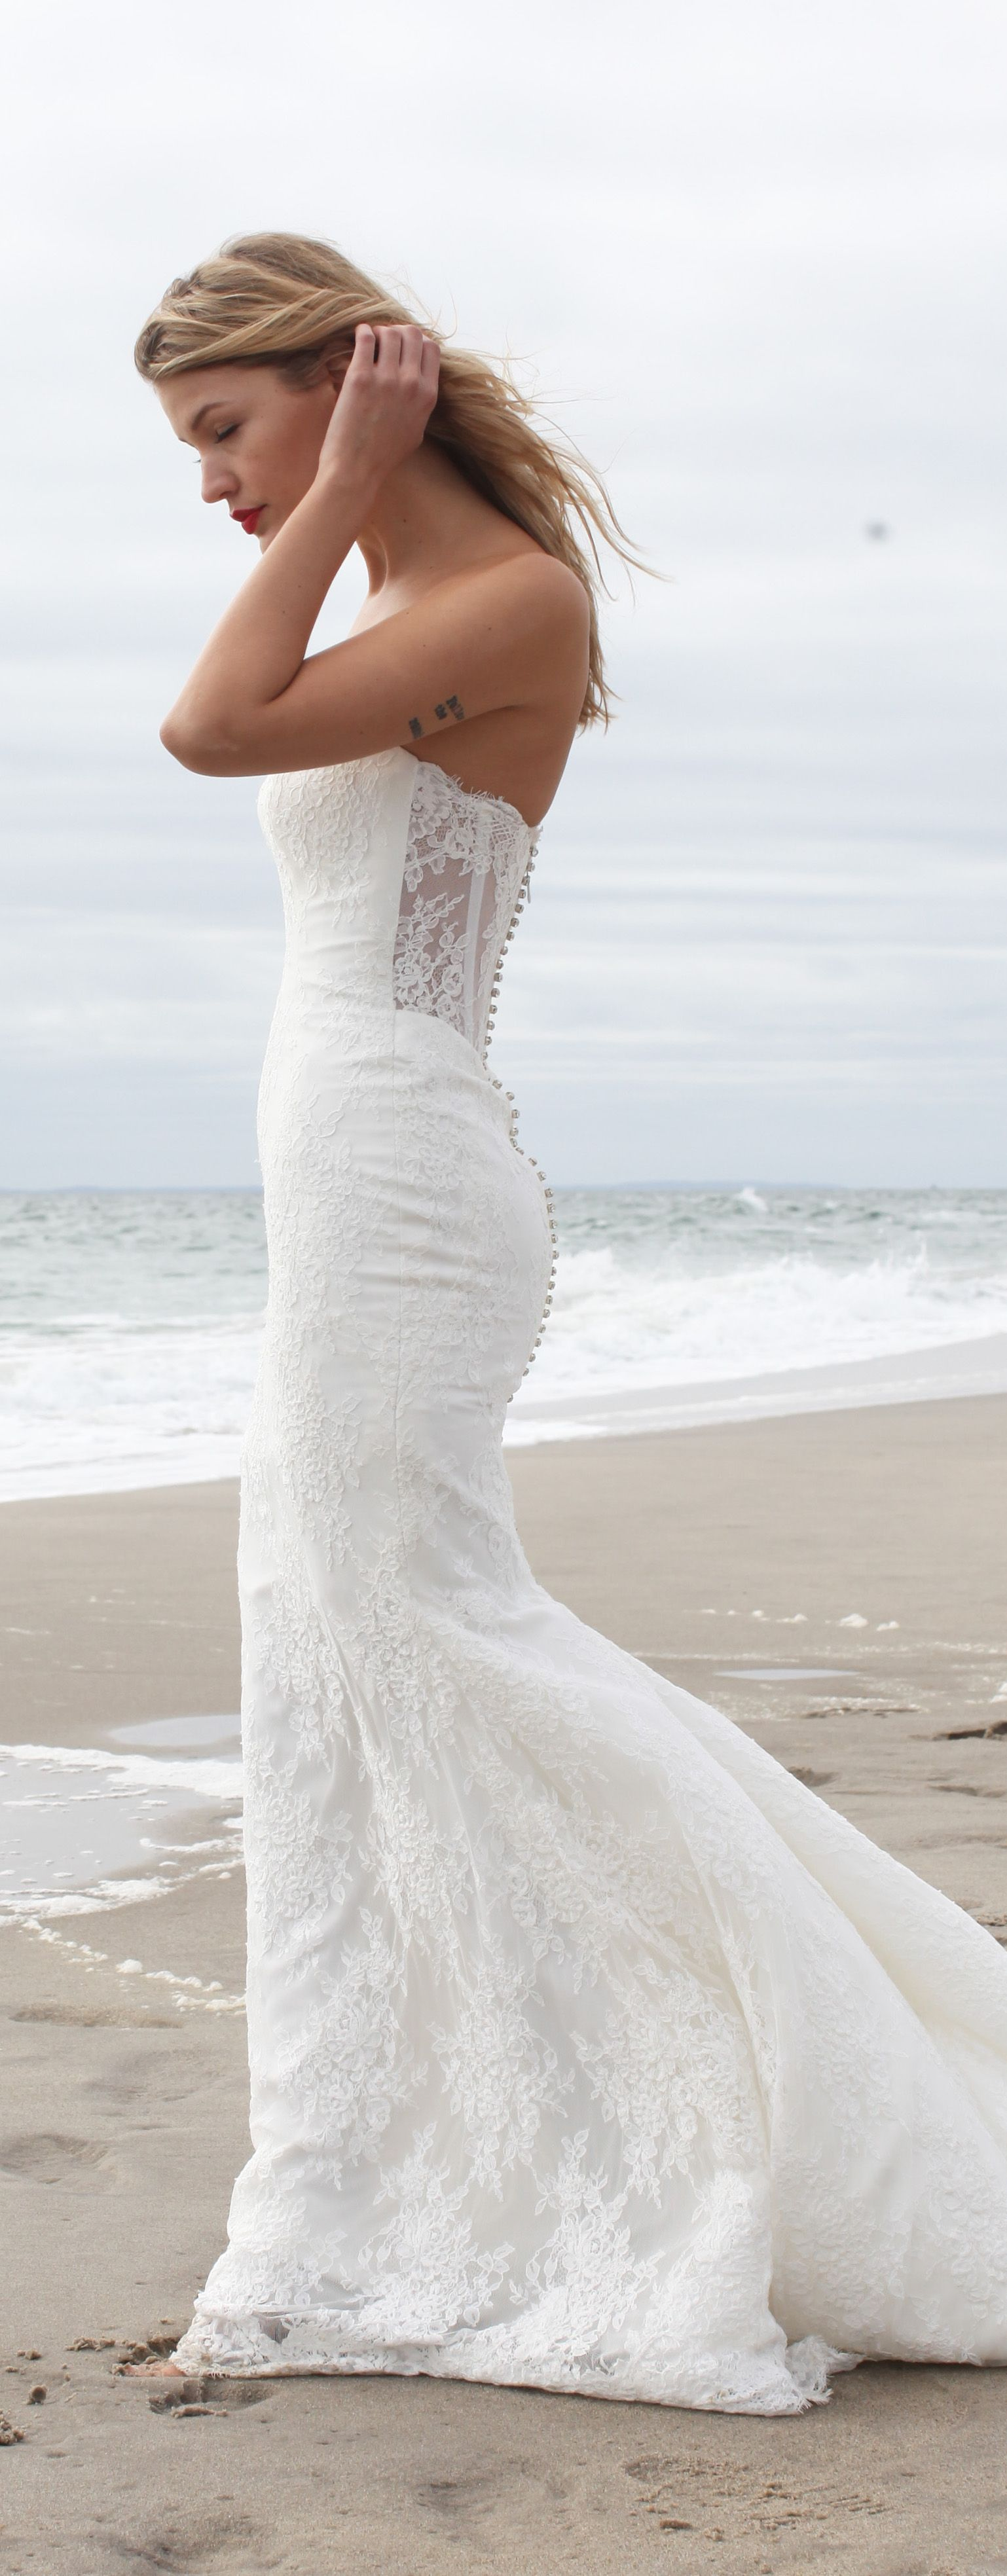 Lace Wedding Dress by Kelly Faetanini I hate mermaid dresses but ...